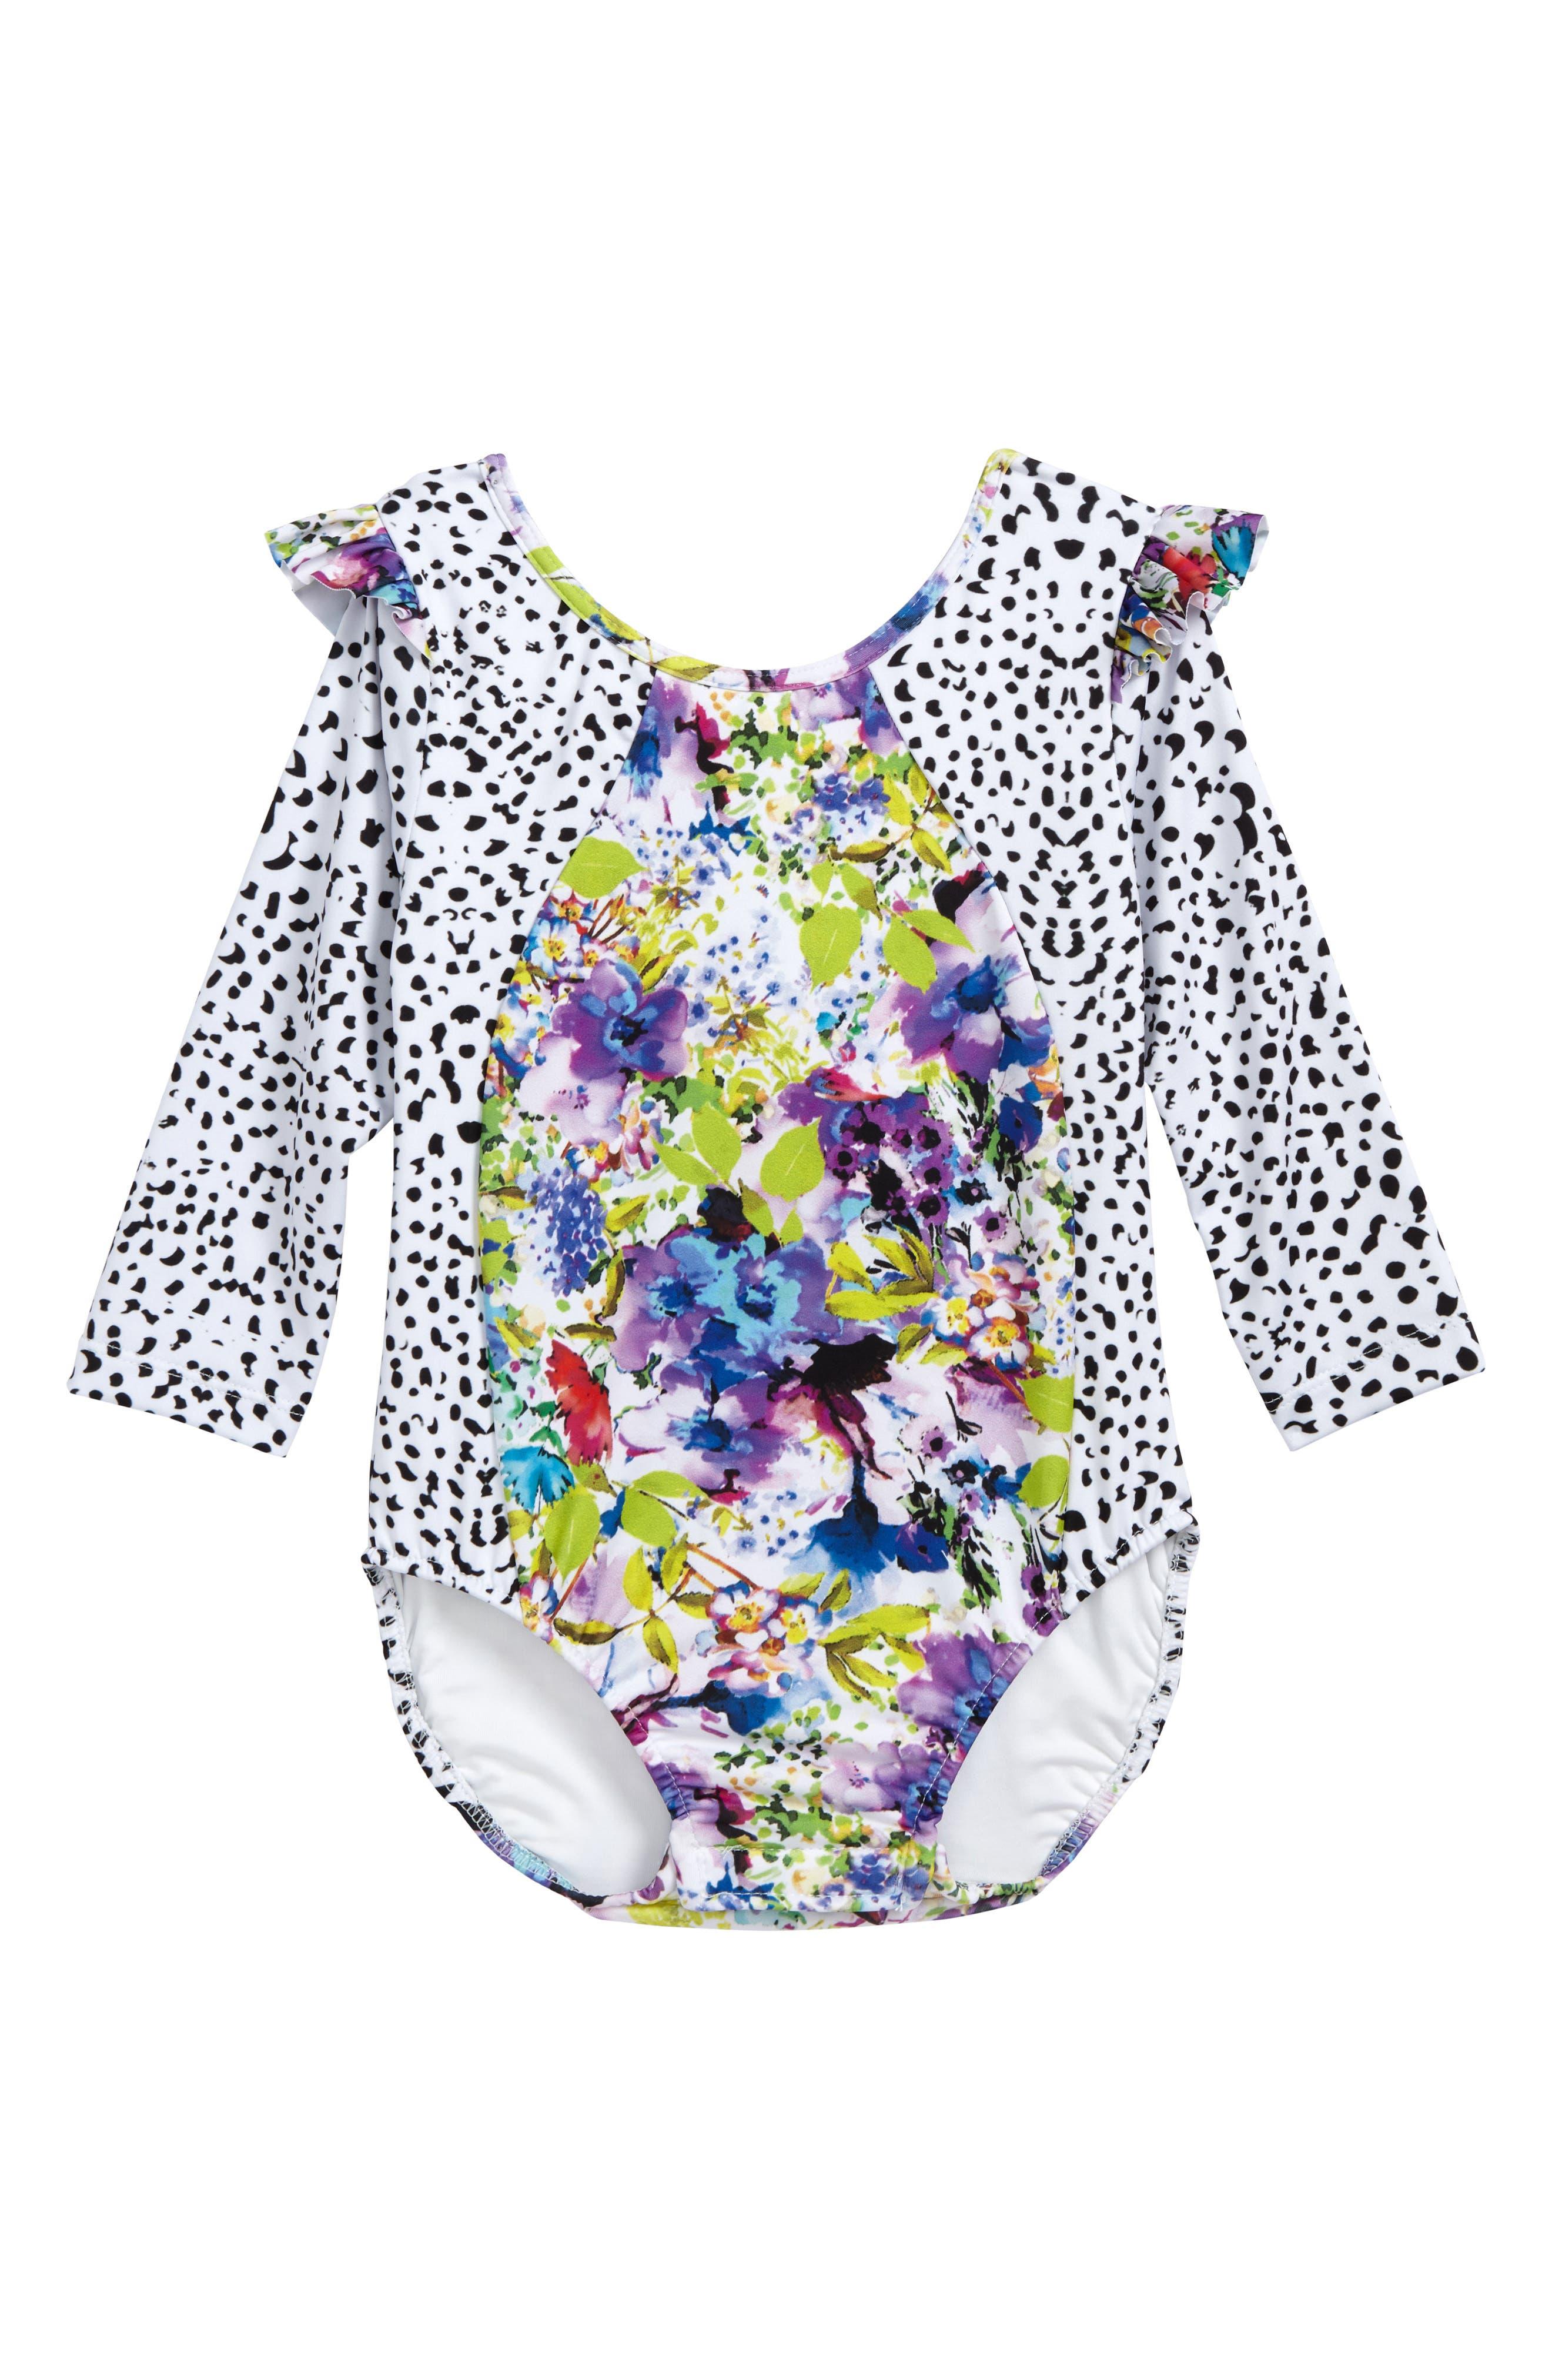 The Salty Baby One-Piece Rashguard Swimsuit (Toddler Girls)